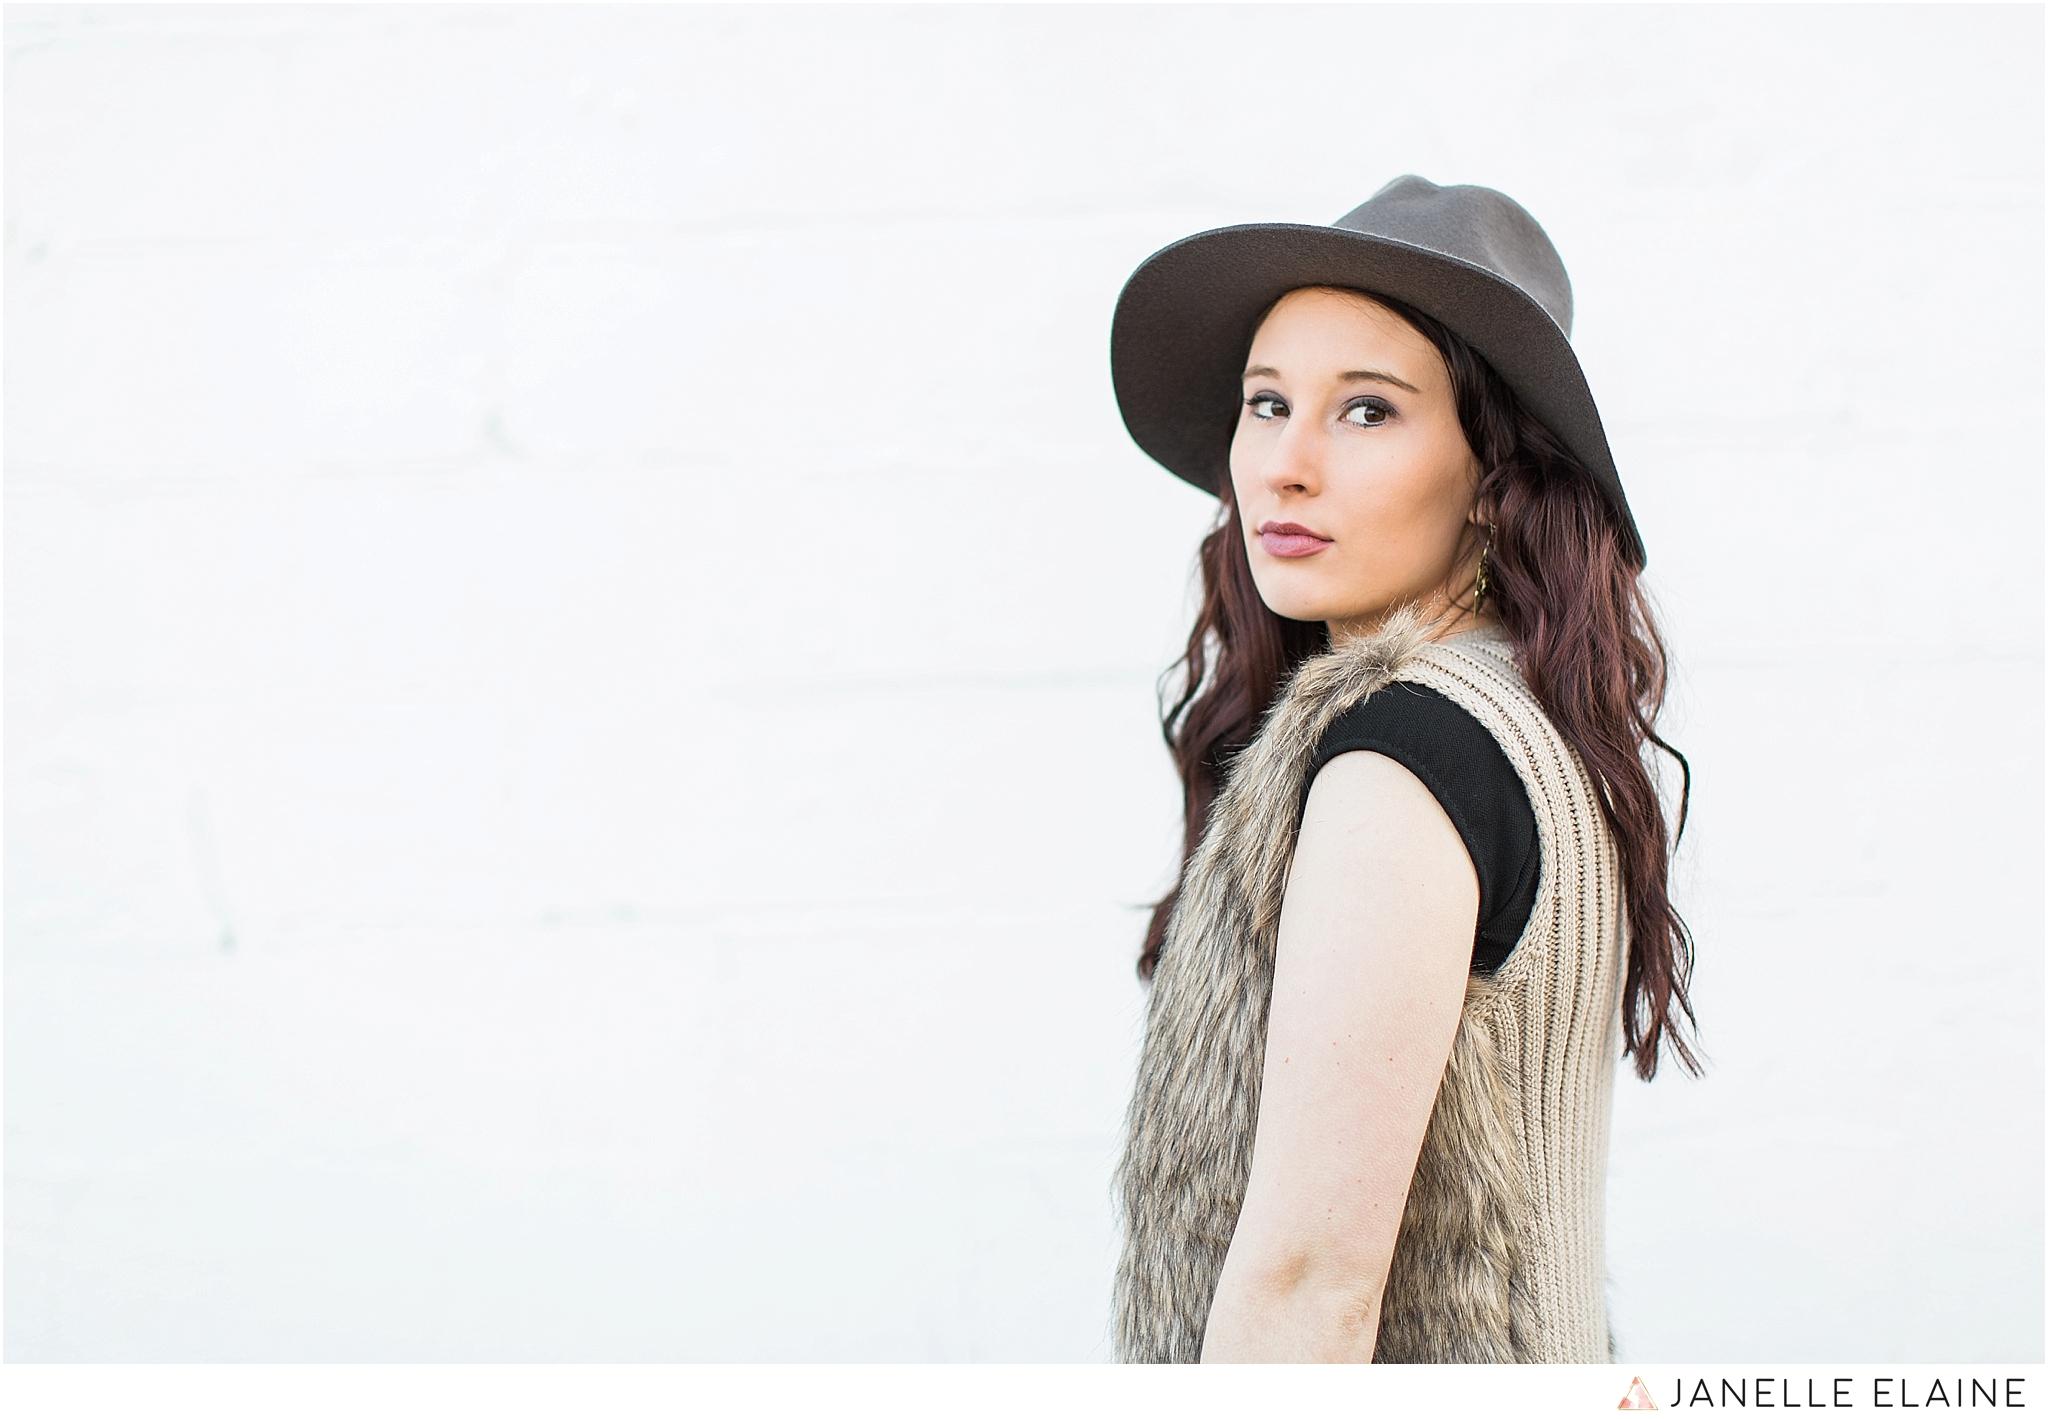 janelle elaine photography-seattle portrait photographer-washington-Hannah-28.jpg